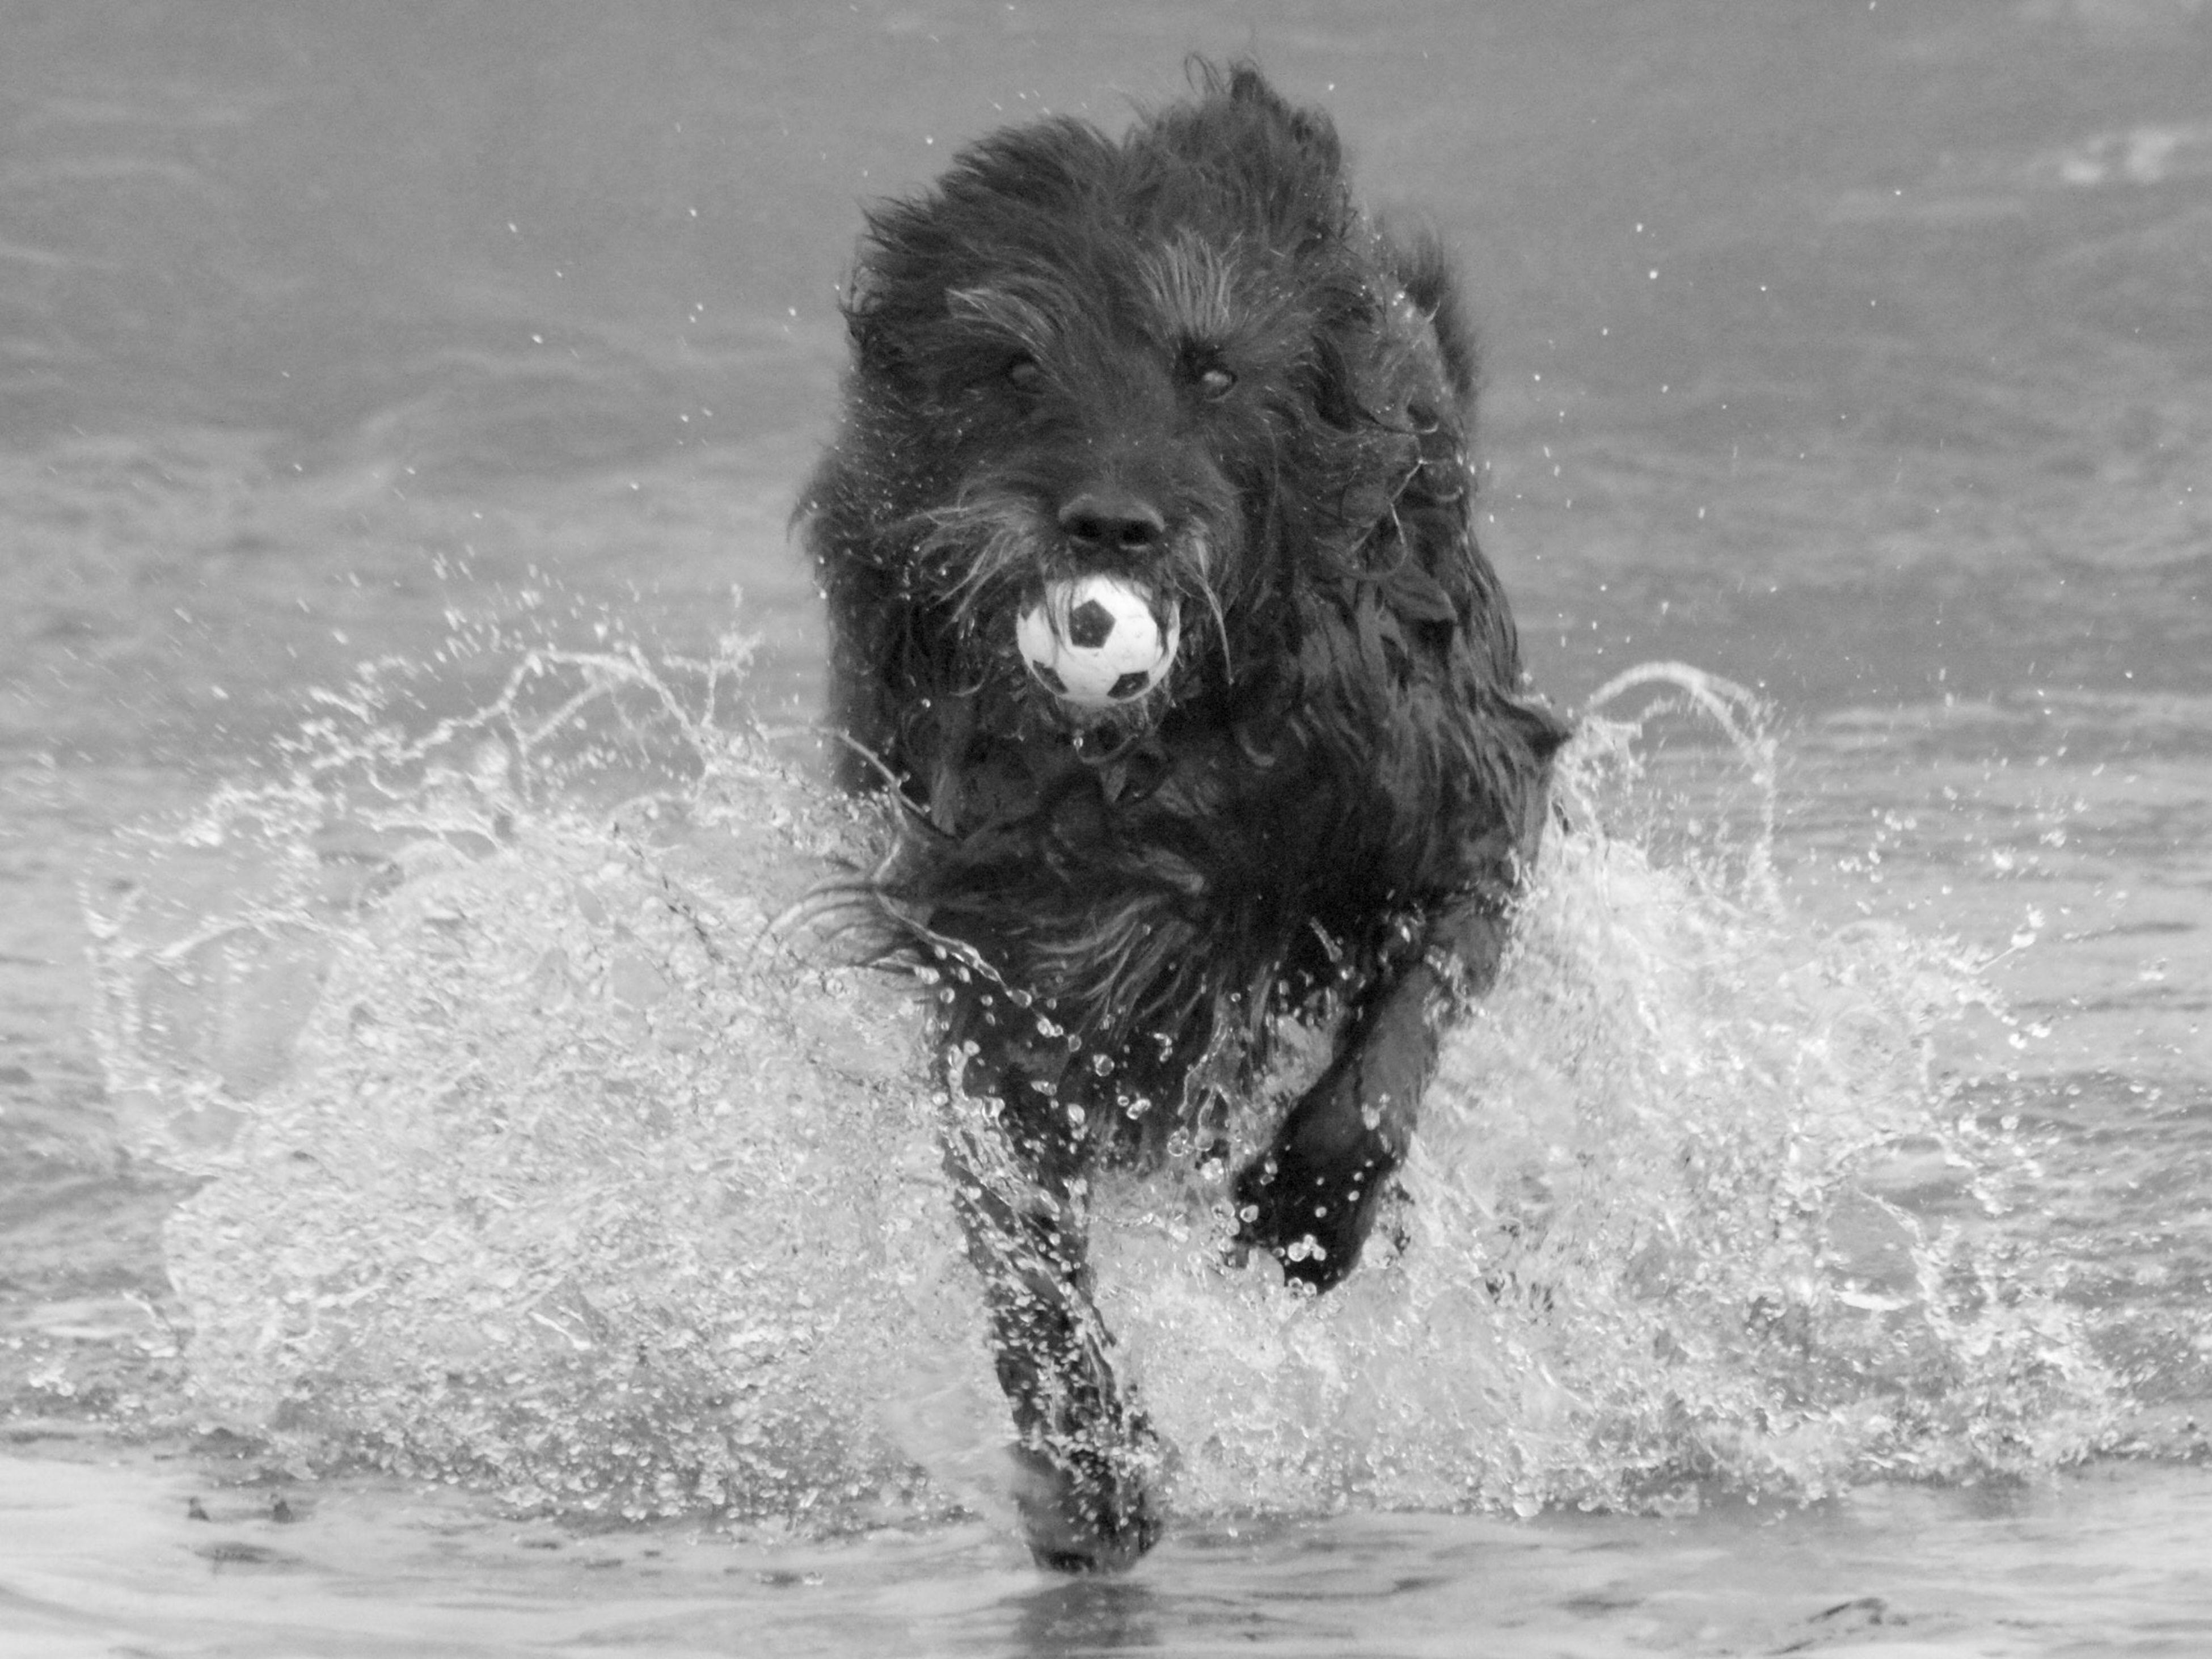 animal themes, splashing, one animal, water, domestic animals, dog, mammal, motion, swimming, waterfront, pets, no people, outdoors, nature, day